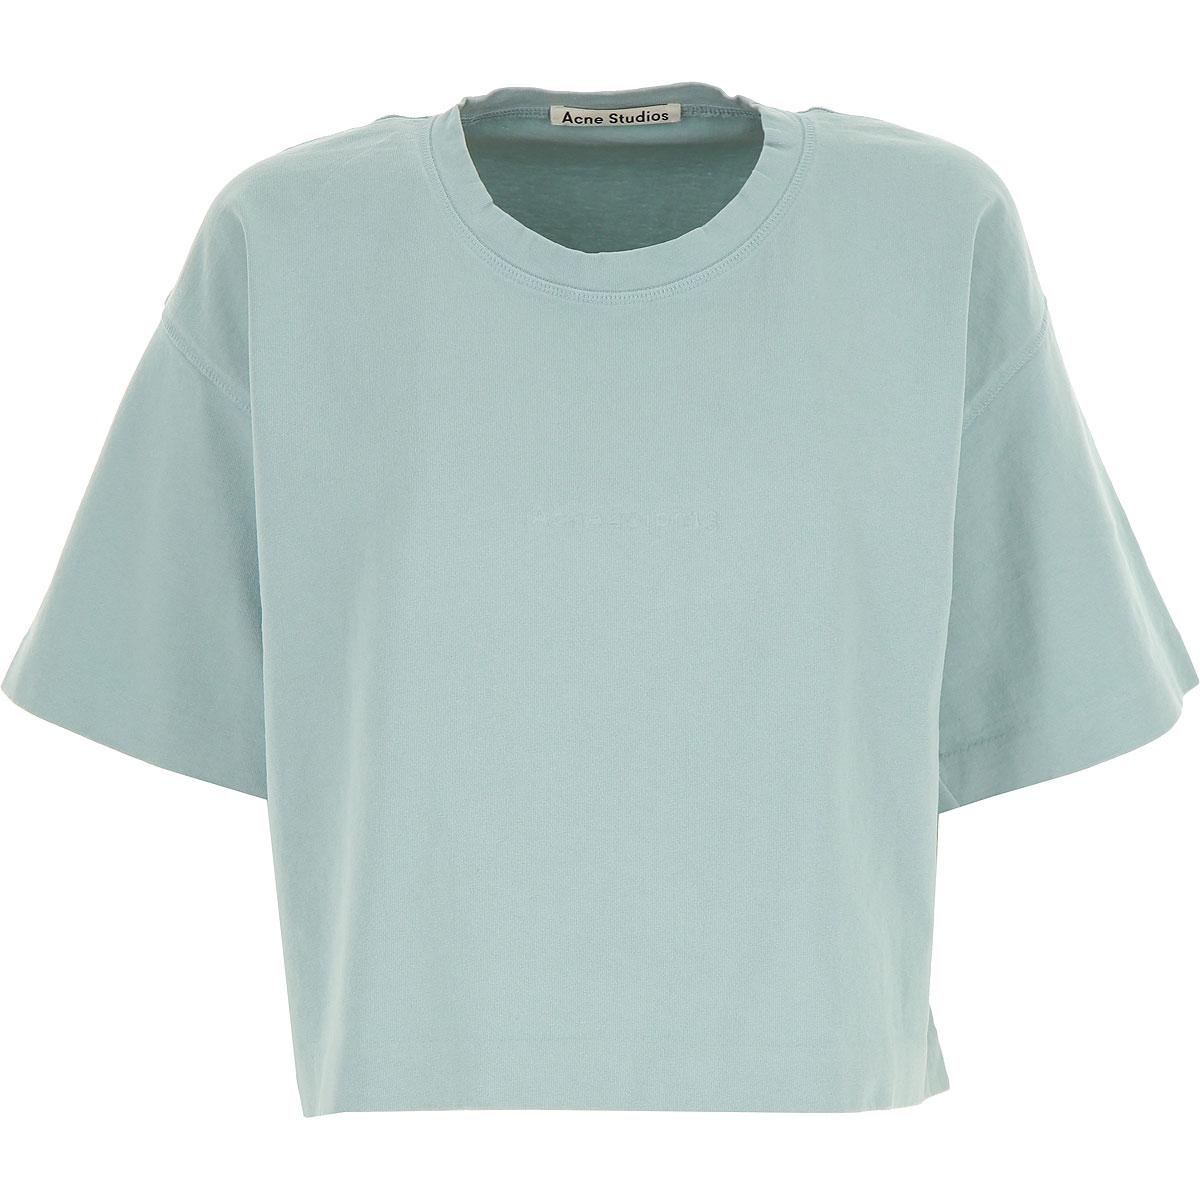 Acne Studios T-Shirt for Women, Light Blue, Cotton, 2017, 2 4